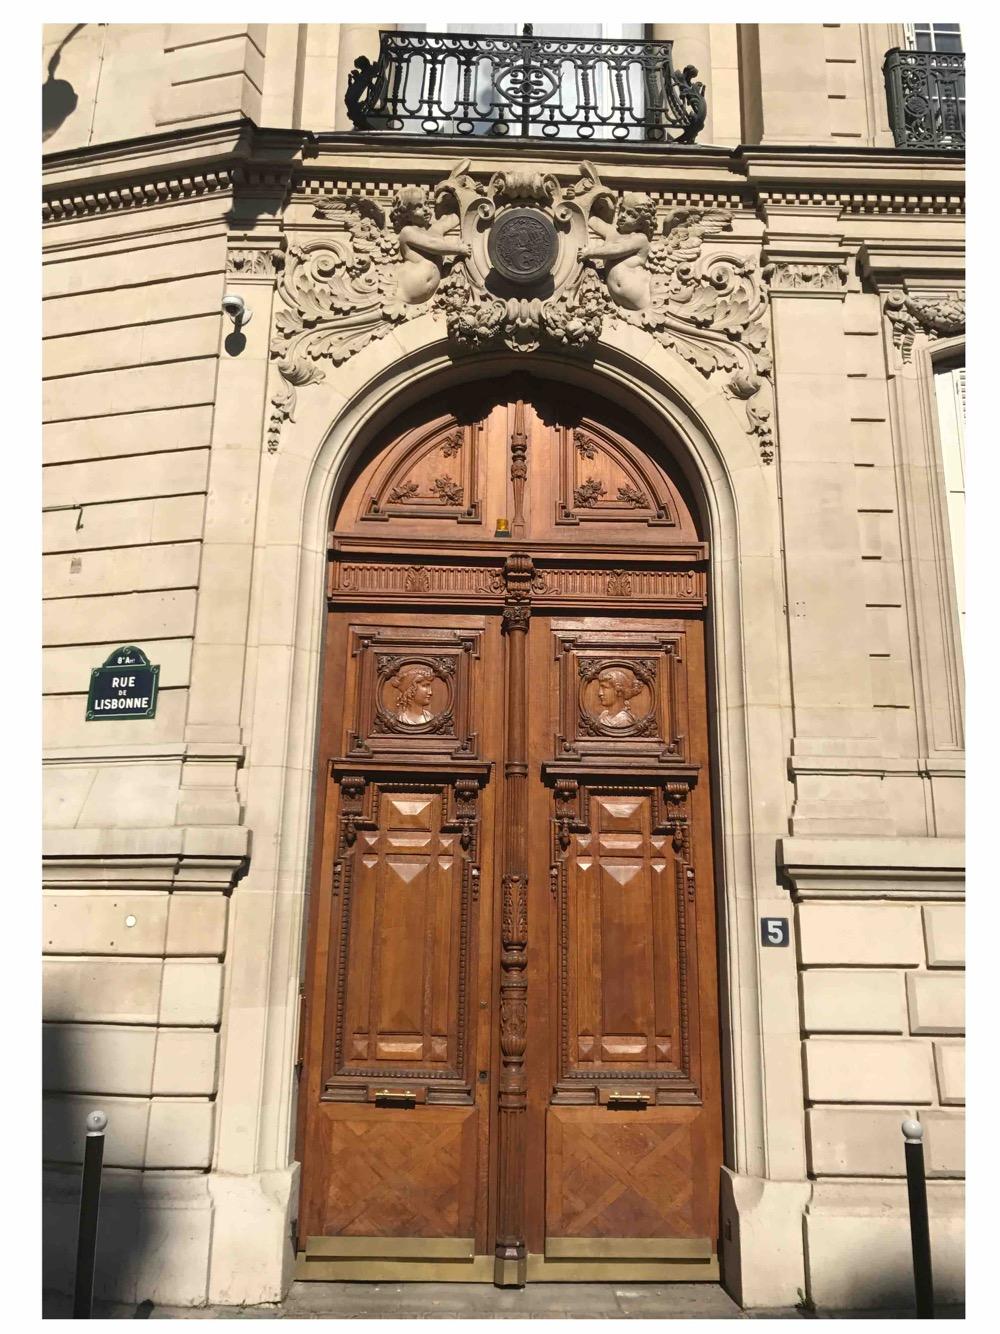 Porte Monumentale 5 Rue De Lisbone - Paris 8